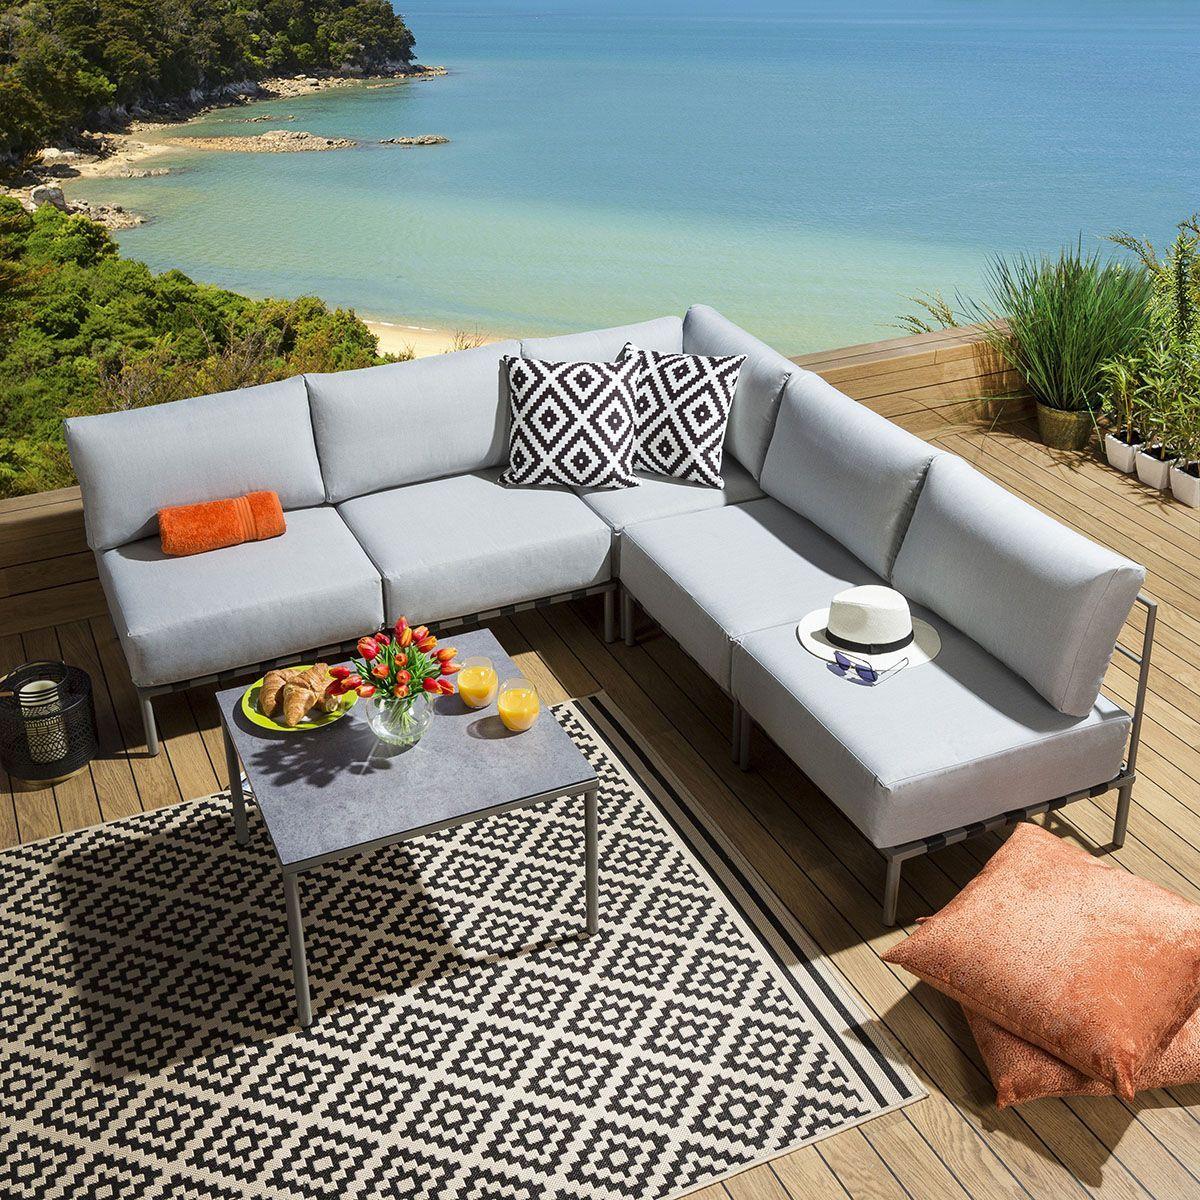 Outdoor Garden Corner Sofa Set L Shape 6 Piece Grey Ceramic Table L6 In 2020 With Images Corner Sofa Set Sofa Set Corner Sofa